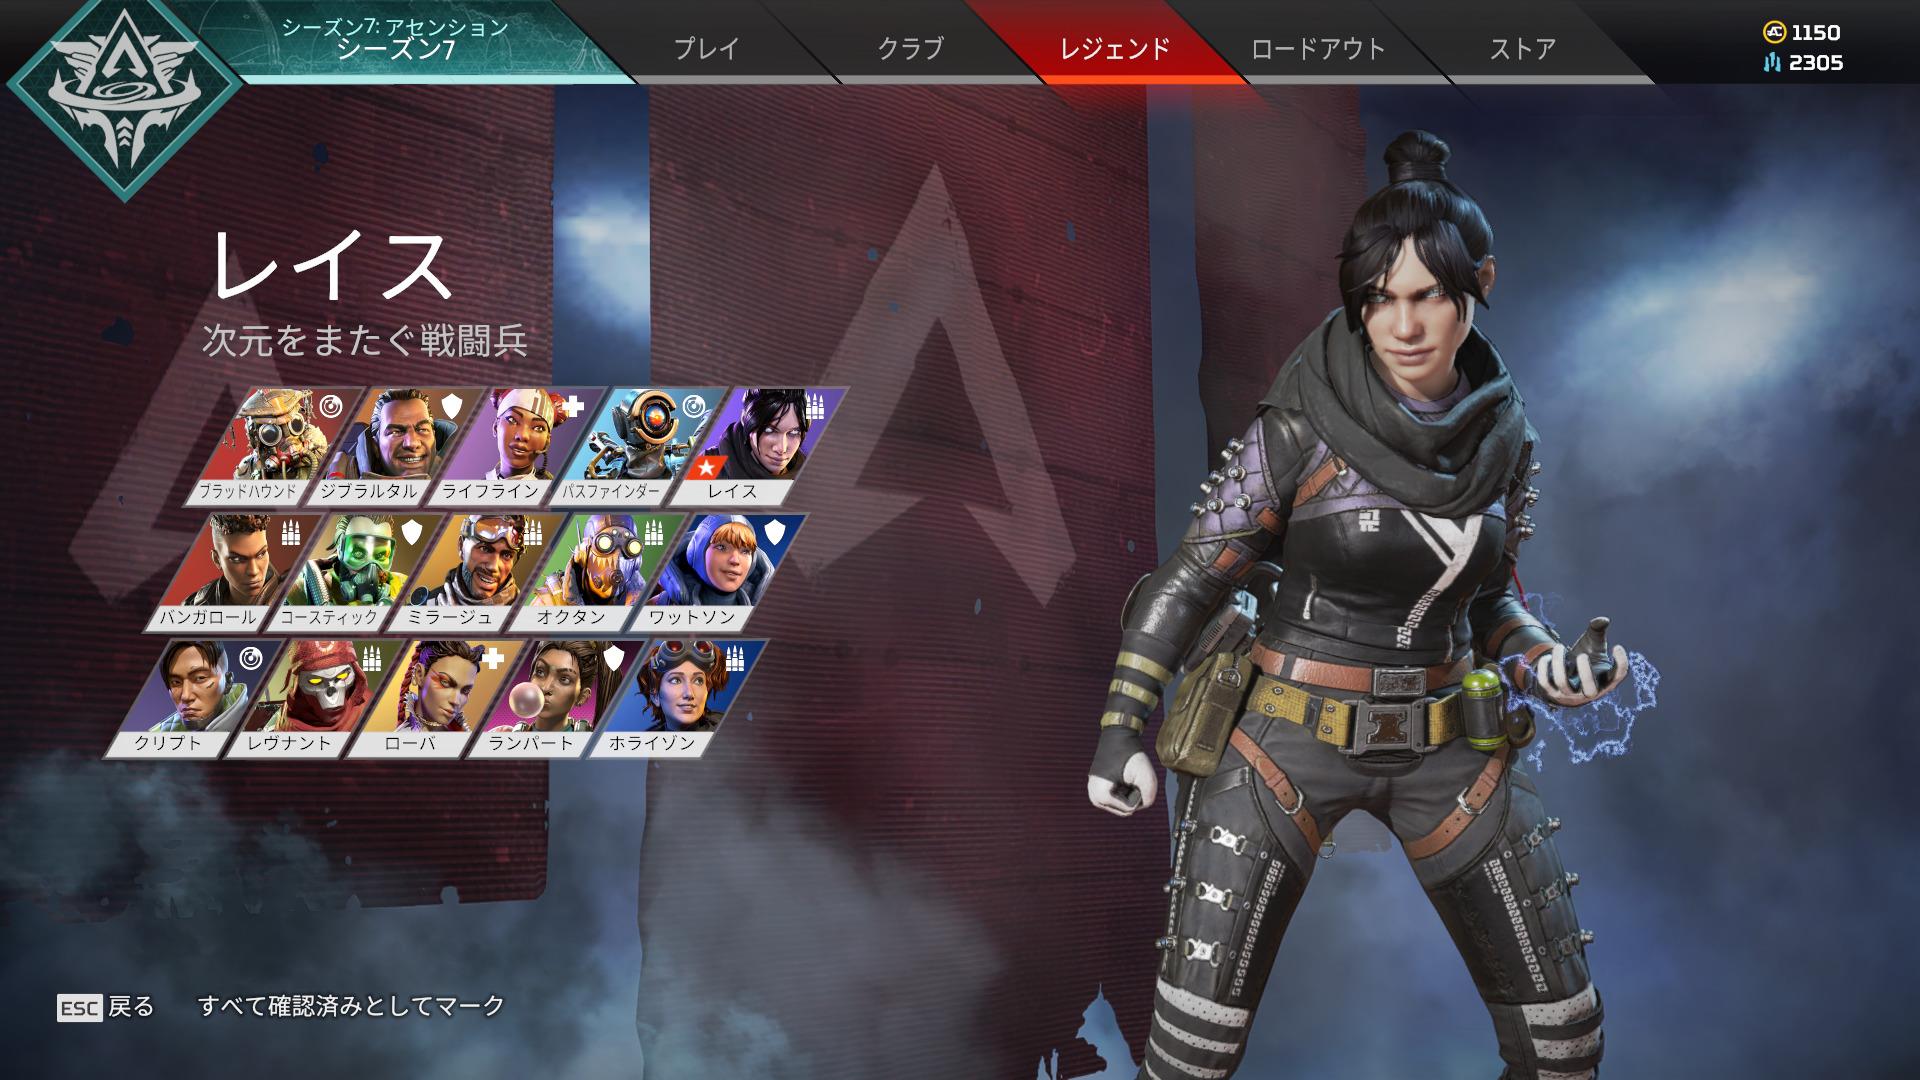 【Apex Legends】レイス 日本語セリフ一覧【基本ボイス】【エーペックスレジェンズ】